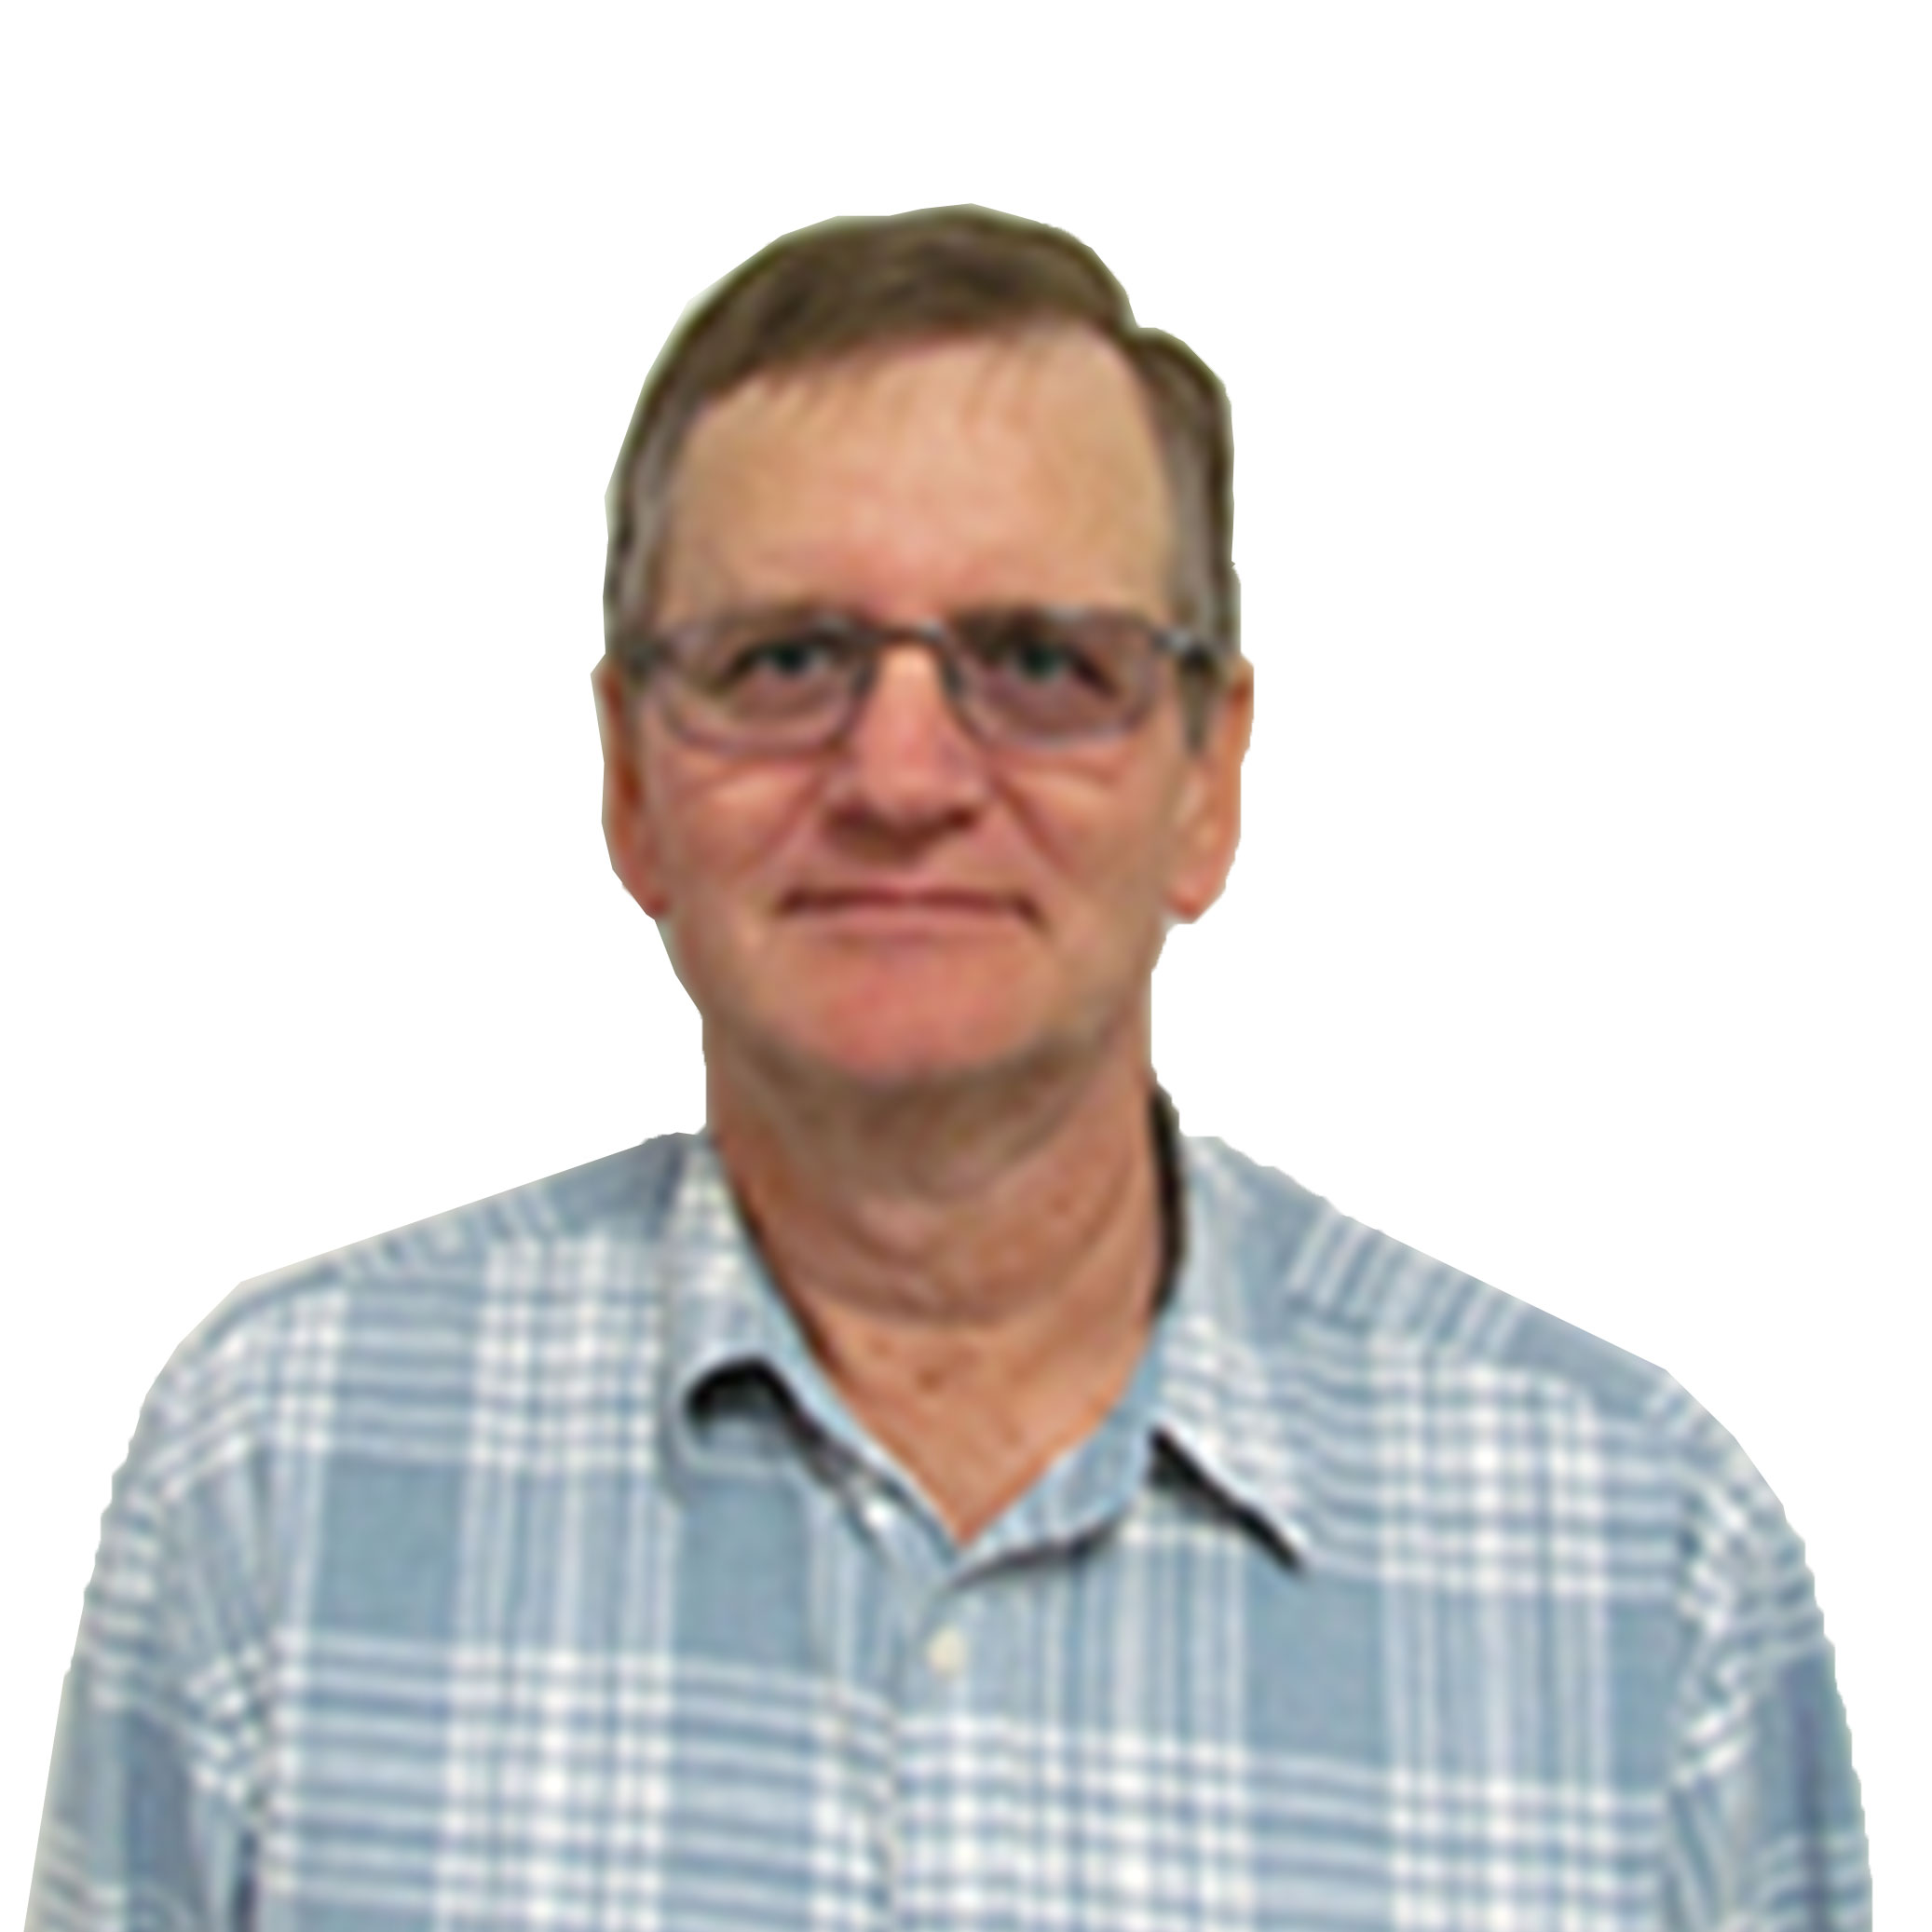 Rick Lowry